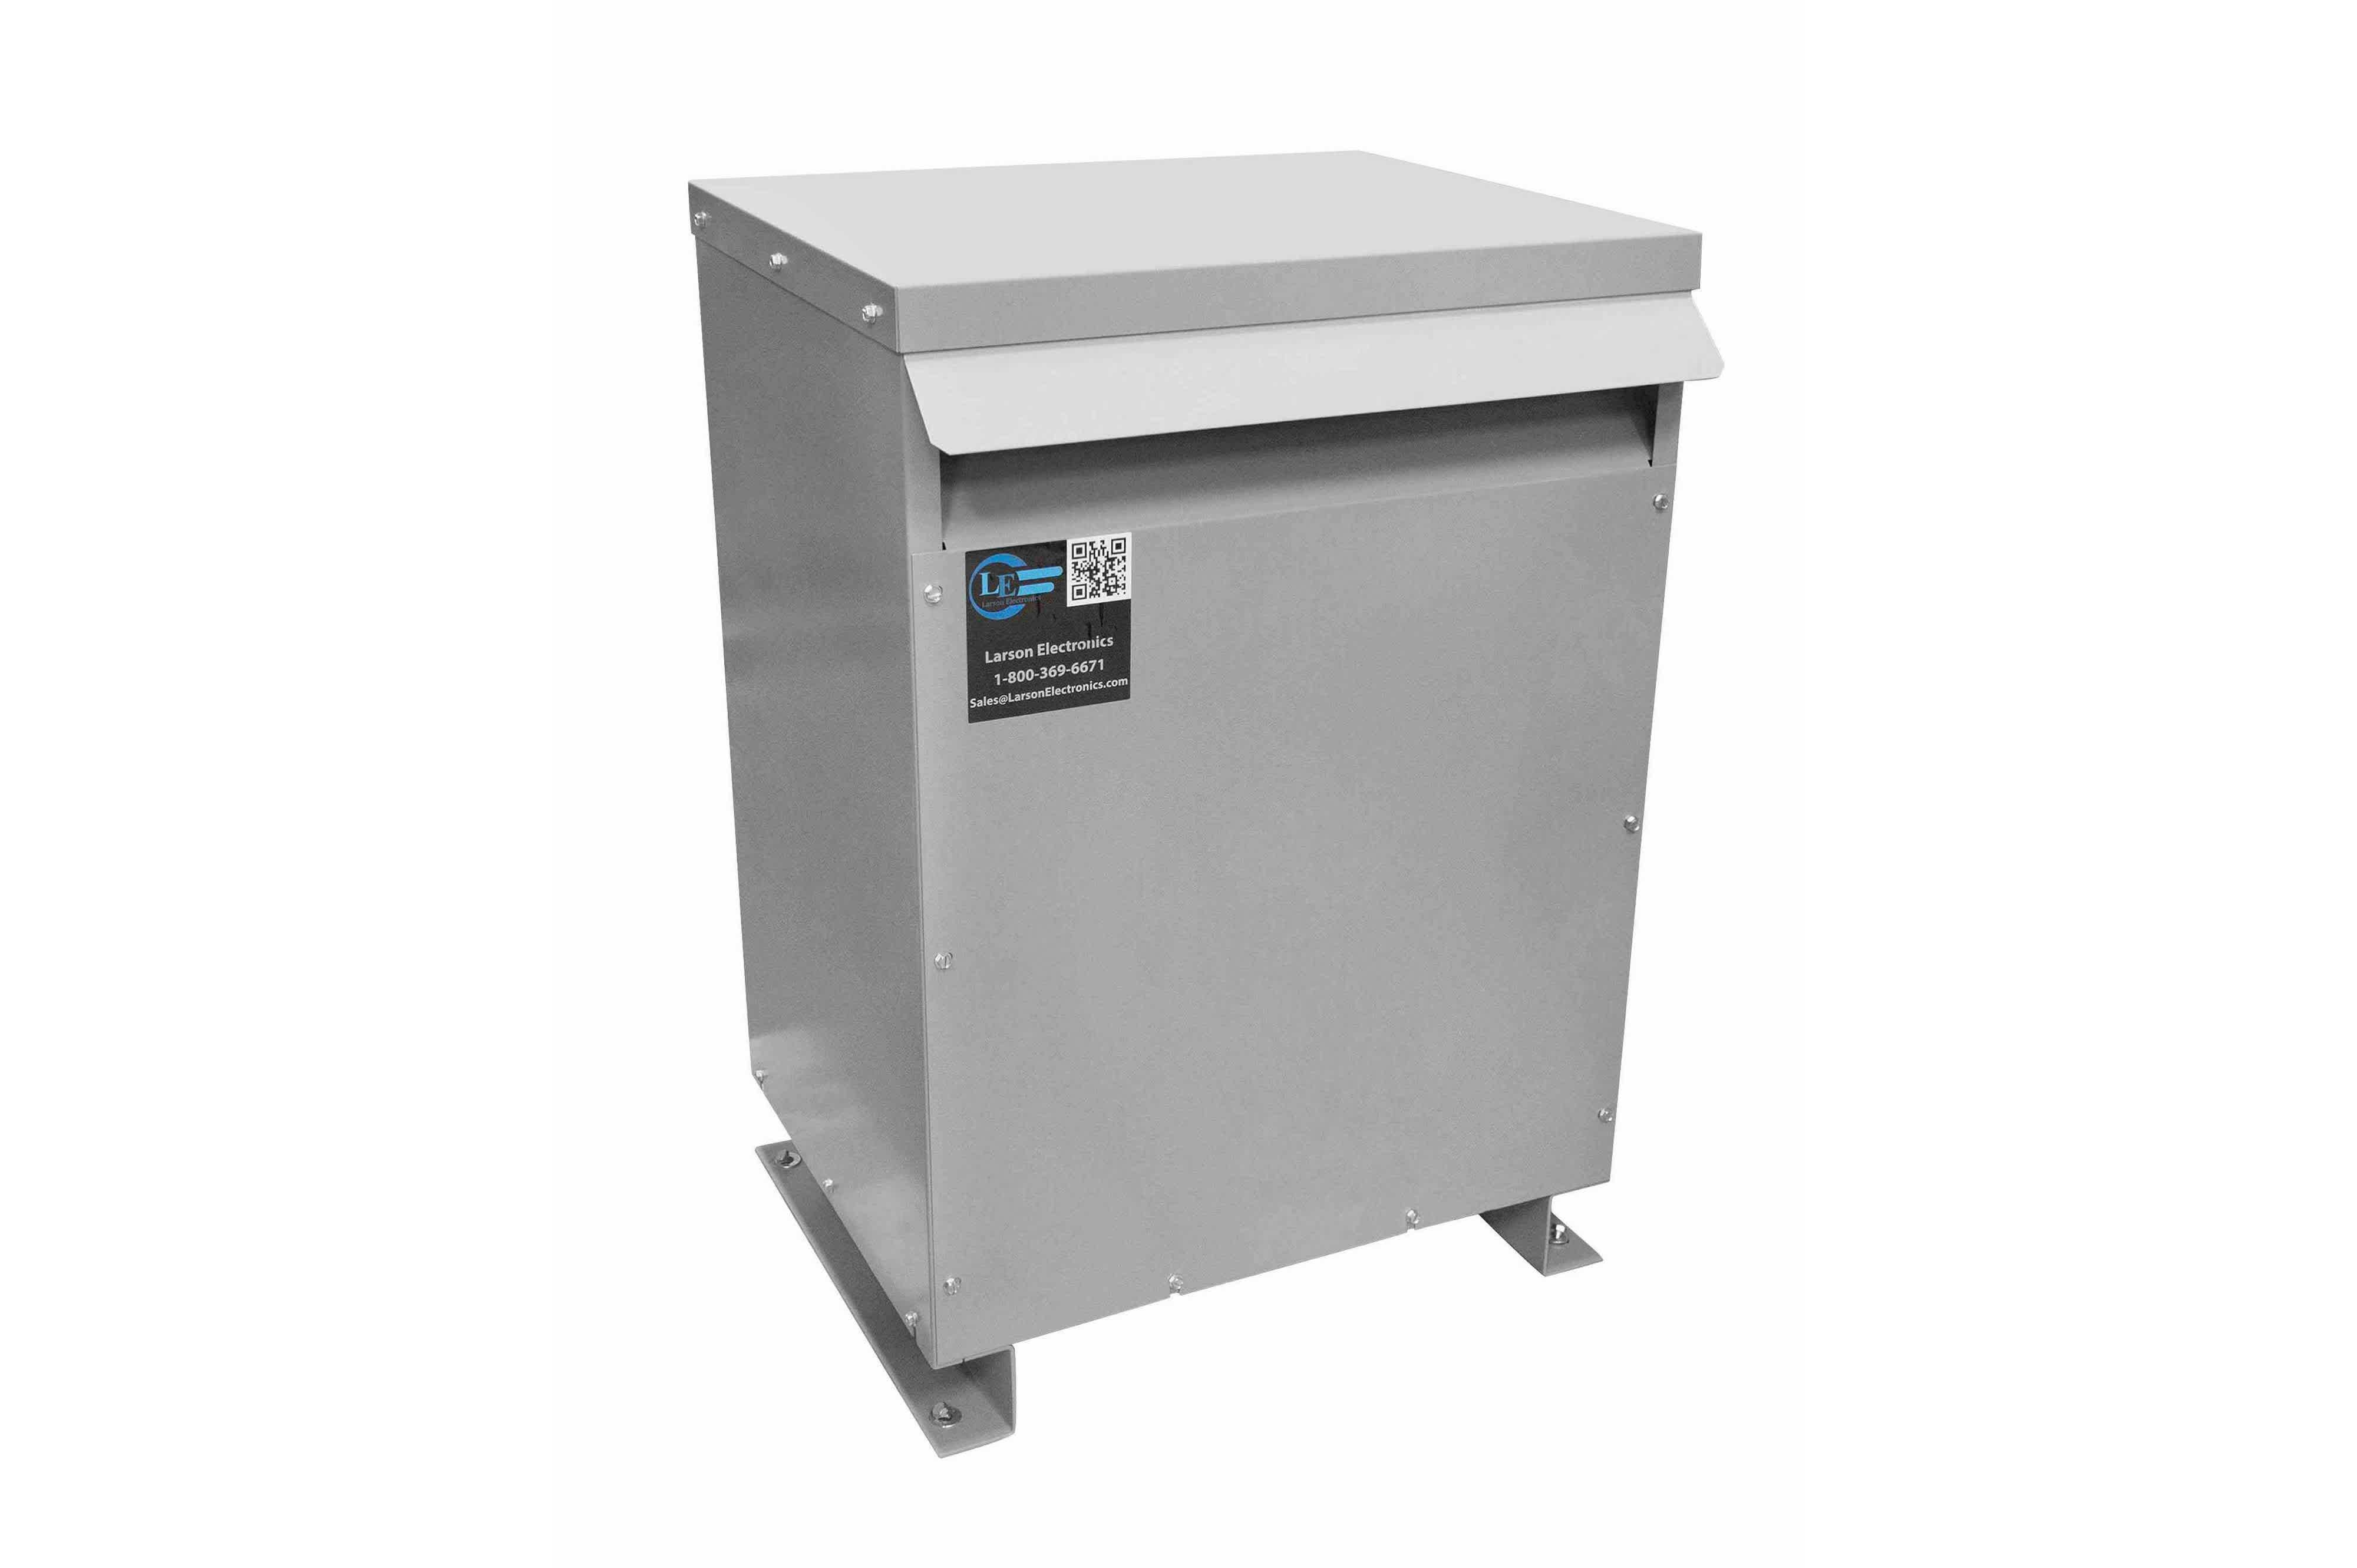 100 kVA 3PH DOE Transformer, 208V Delta Primary, 480Y/277 Wye-N Secondary, N3R, Ventilated, 60 Hz